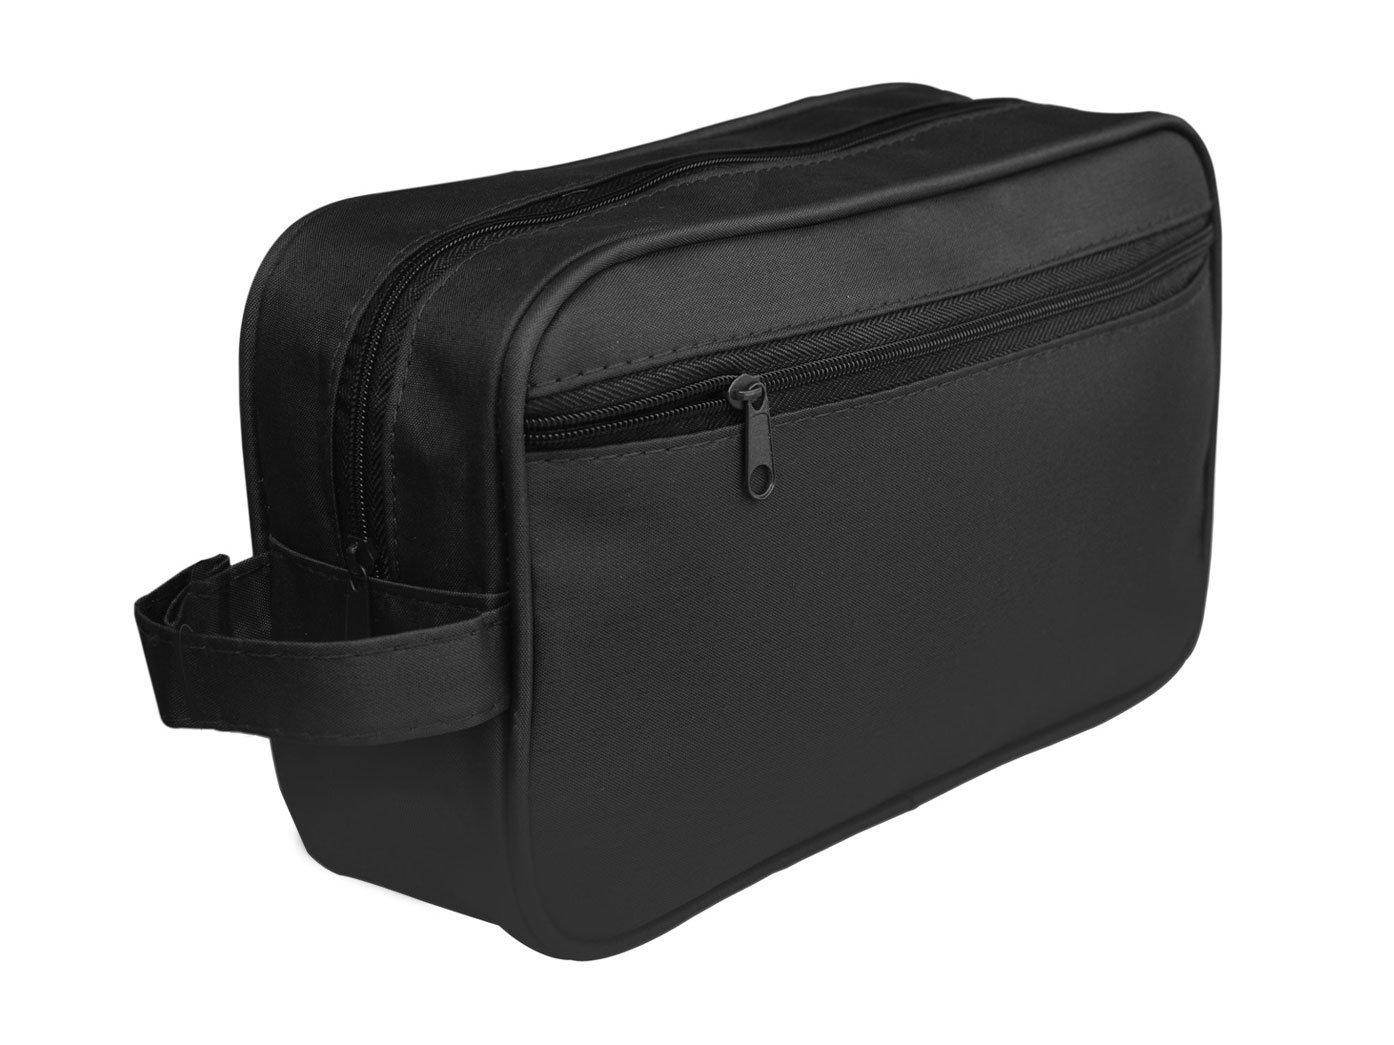 489064e443 Toiletry Bag Travel Overnight Wash Gym Shaving Bag For Men s Or Ladies  (Black)  Amazon.co.uk  Luggage